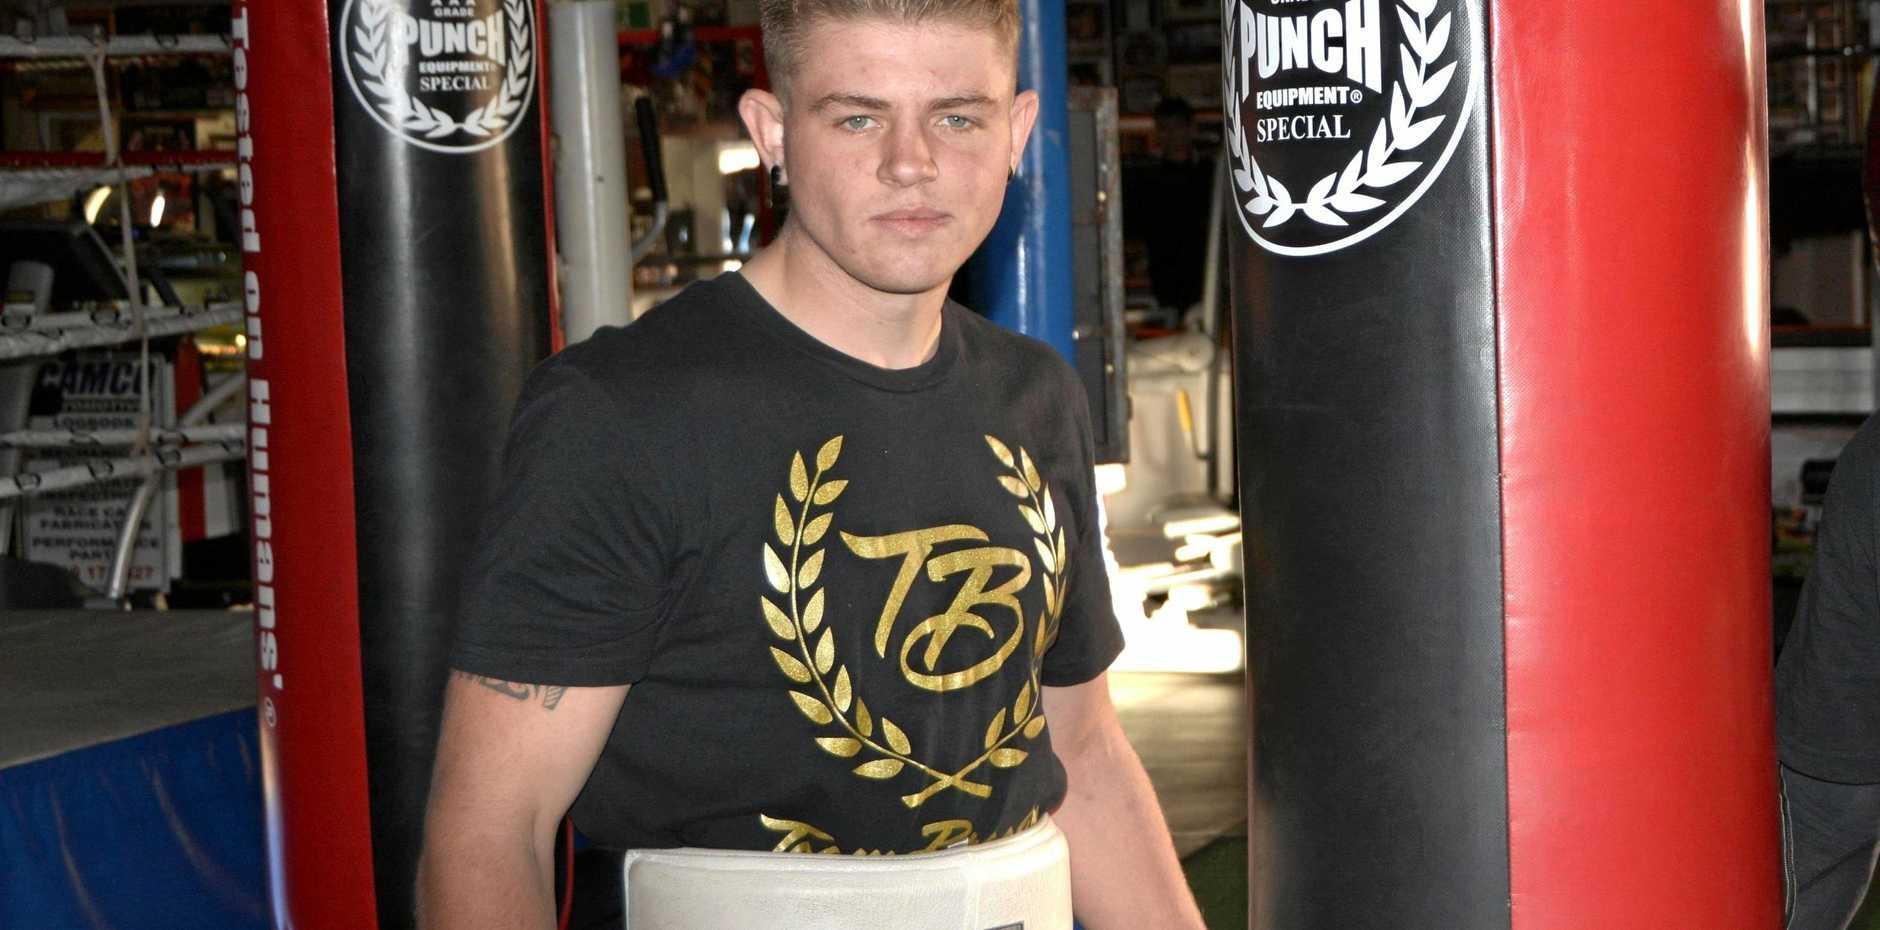 Exciting Toowoomba prospect Chris Brackin returns to the ring at Rumours International next Saturday night.